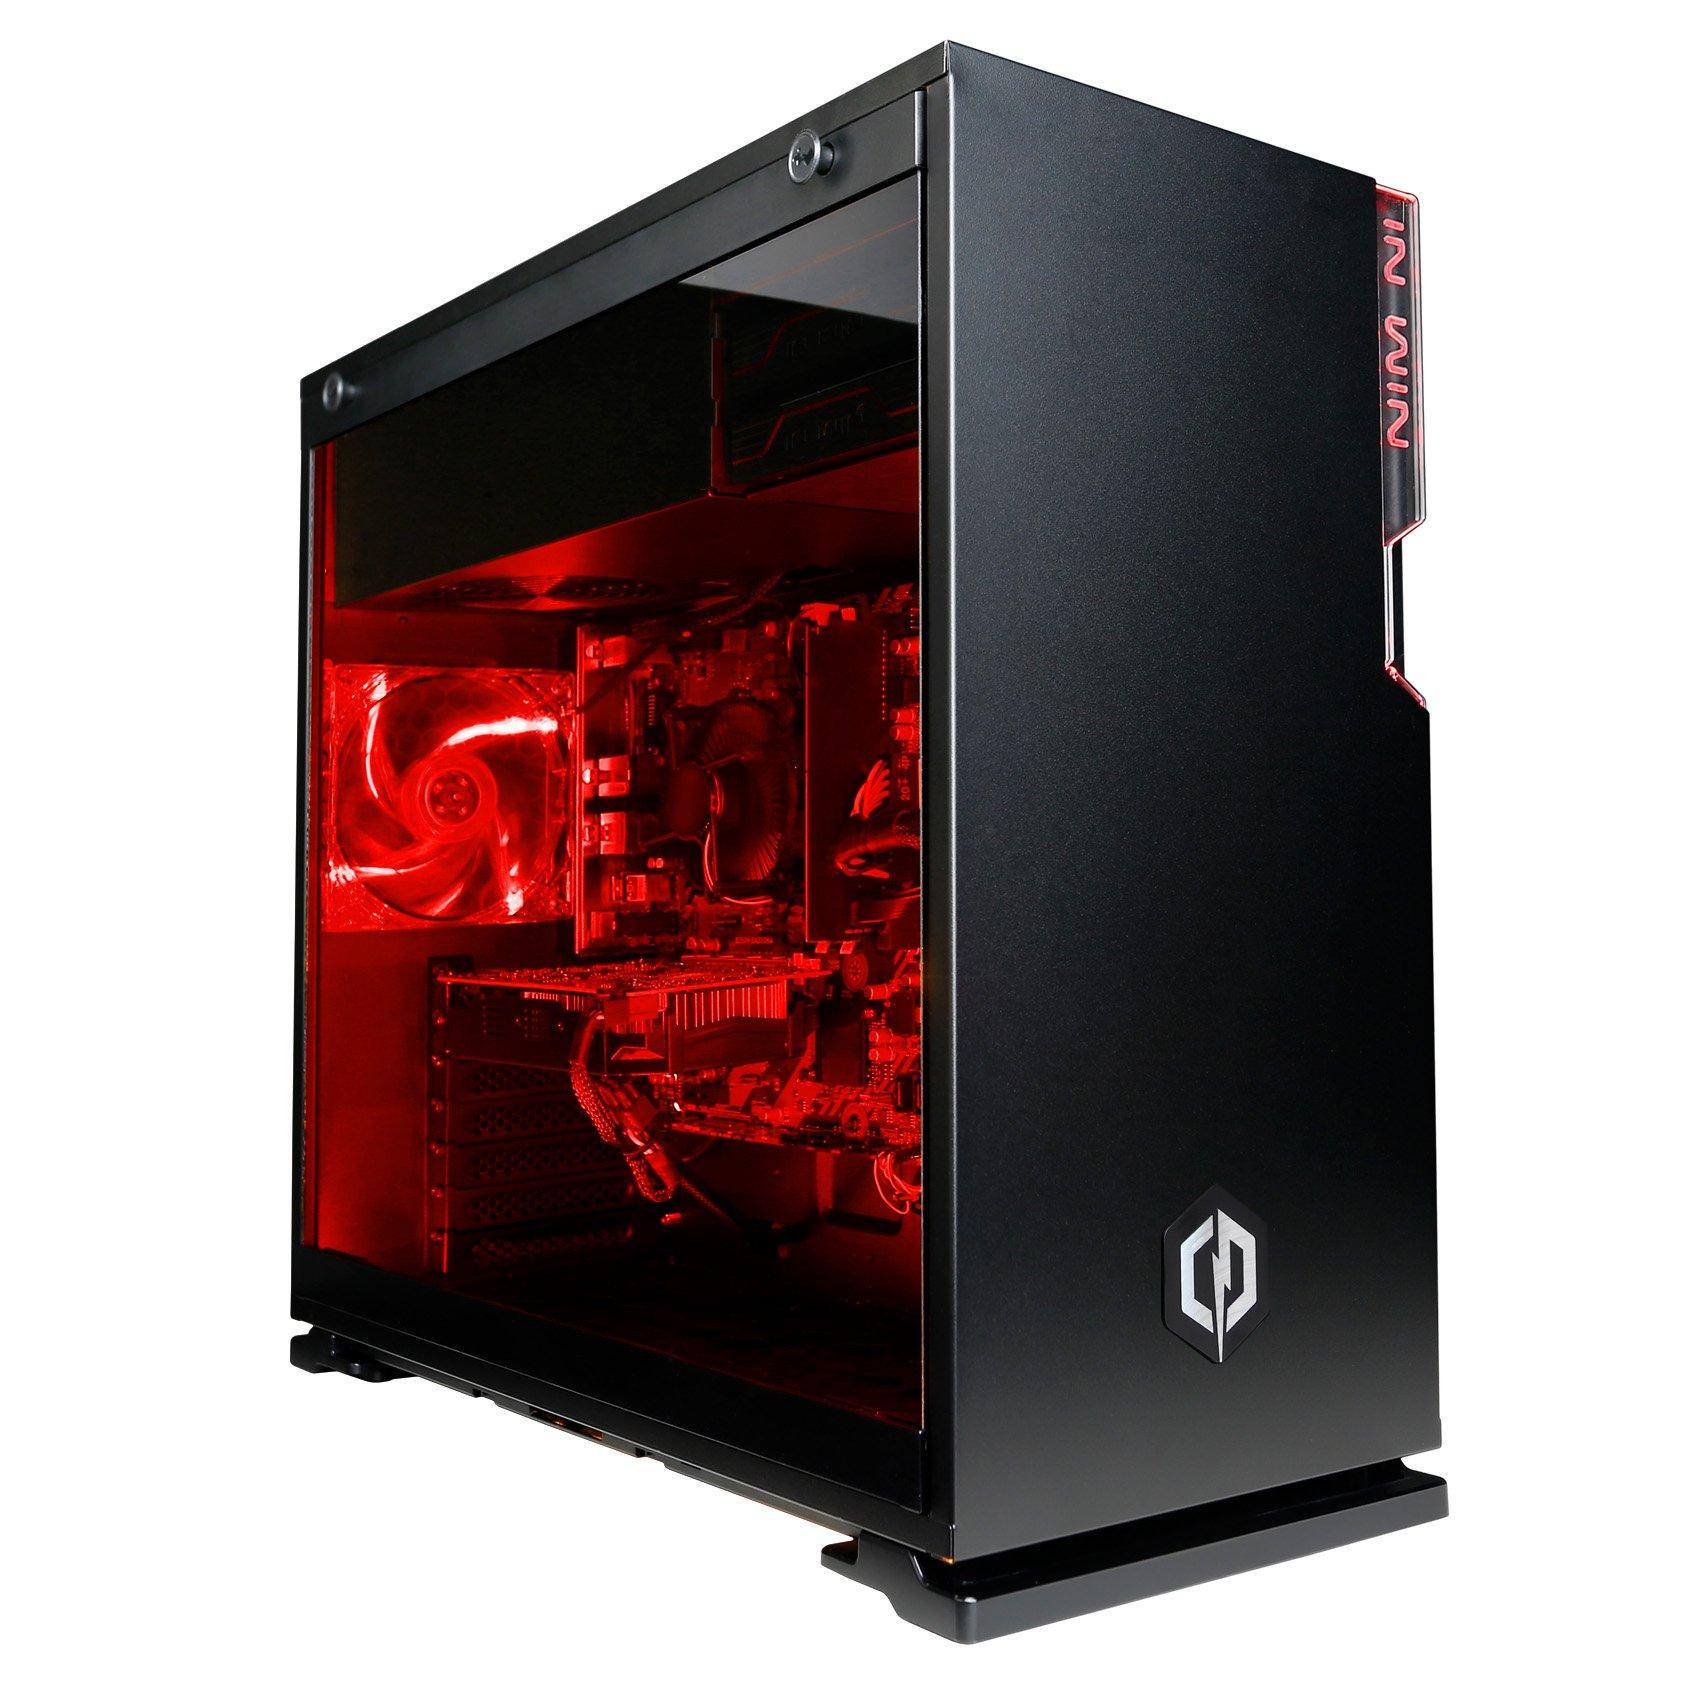 CyberpowerPC Warrior Gaming PC